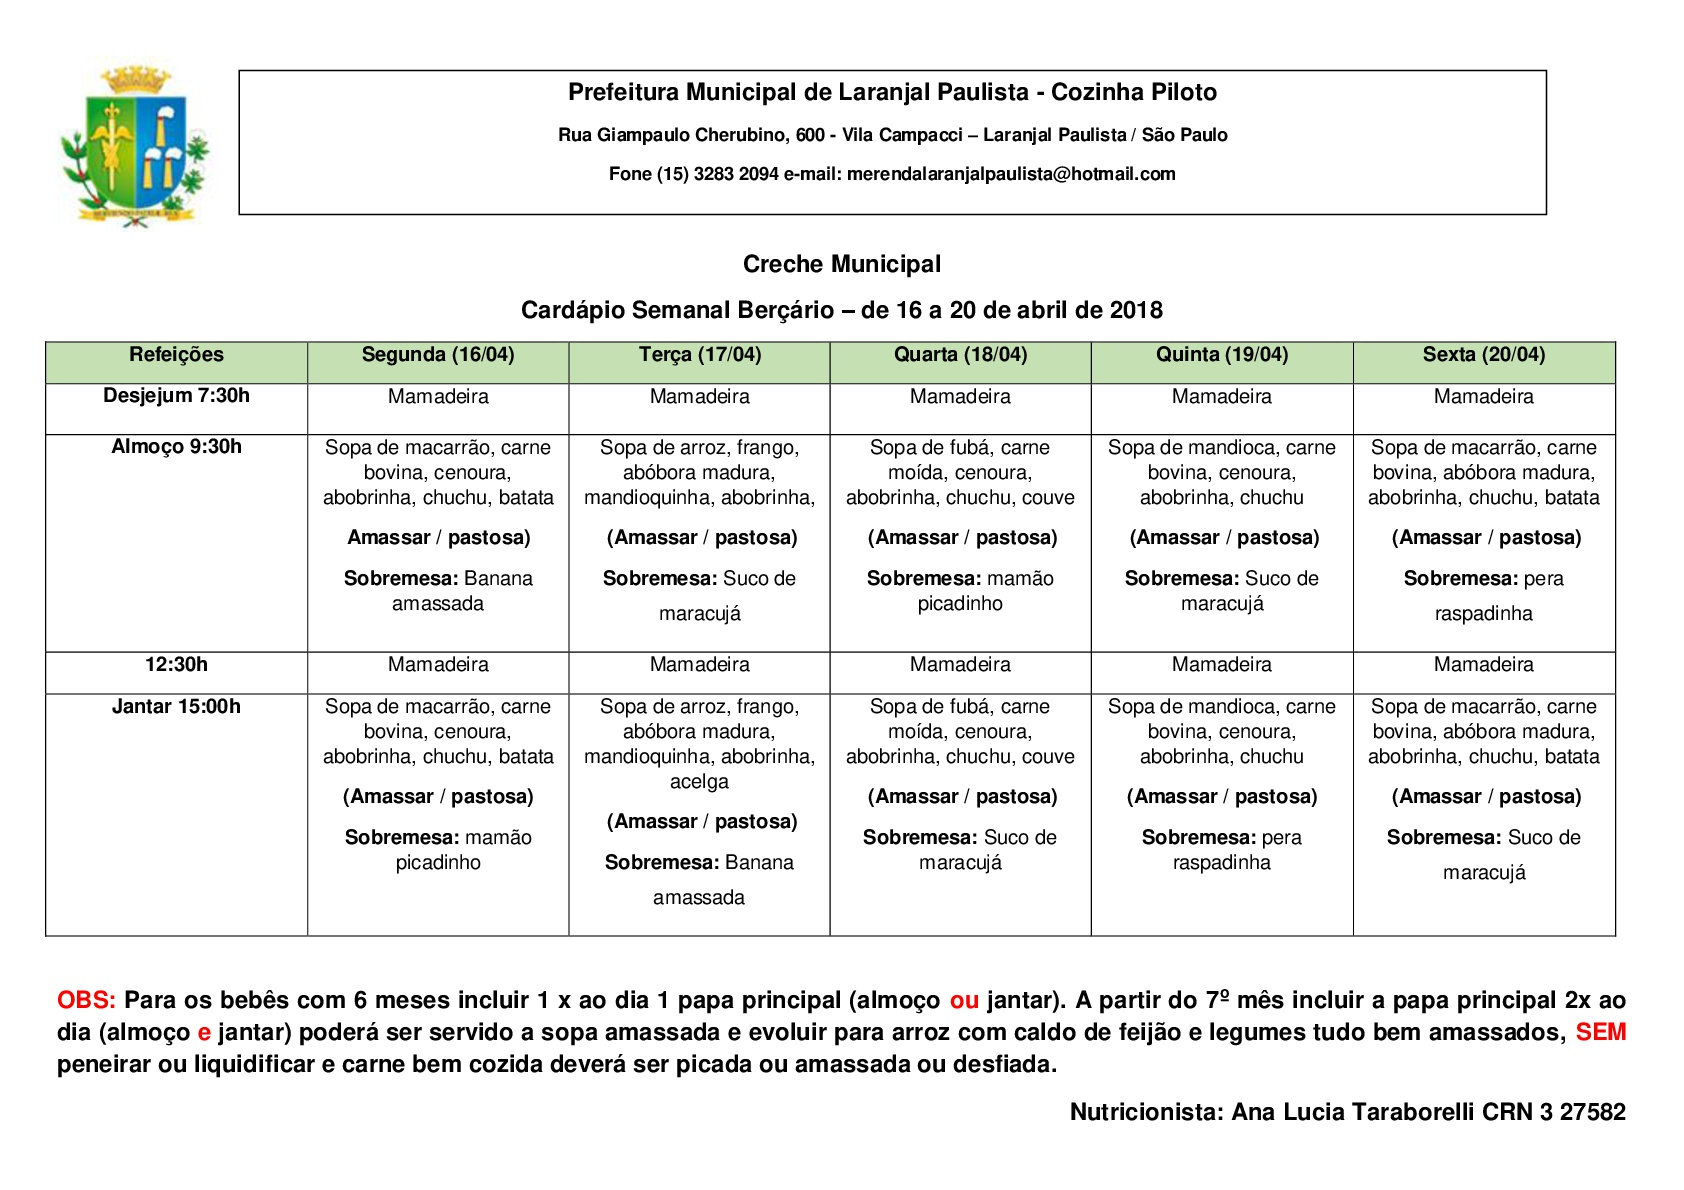 Cardápios da merenda para o mês de Abril das Escolas e Creches de Laranjal Paulista.